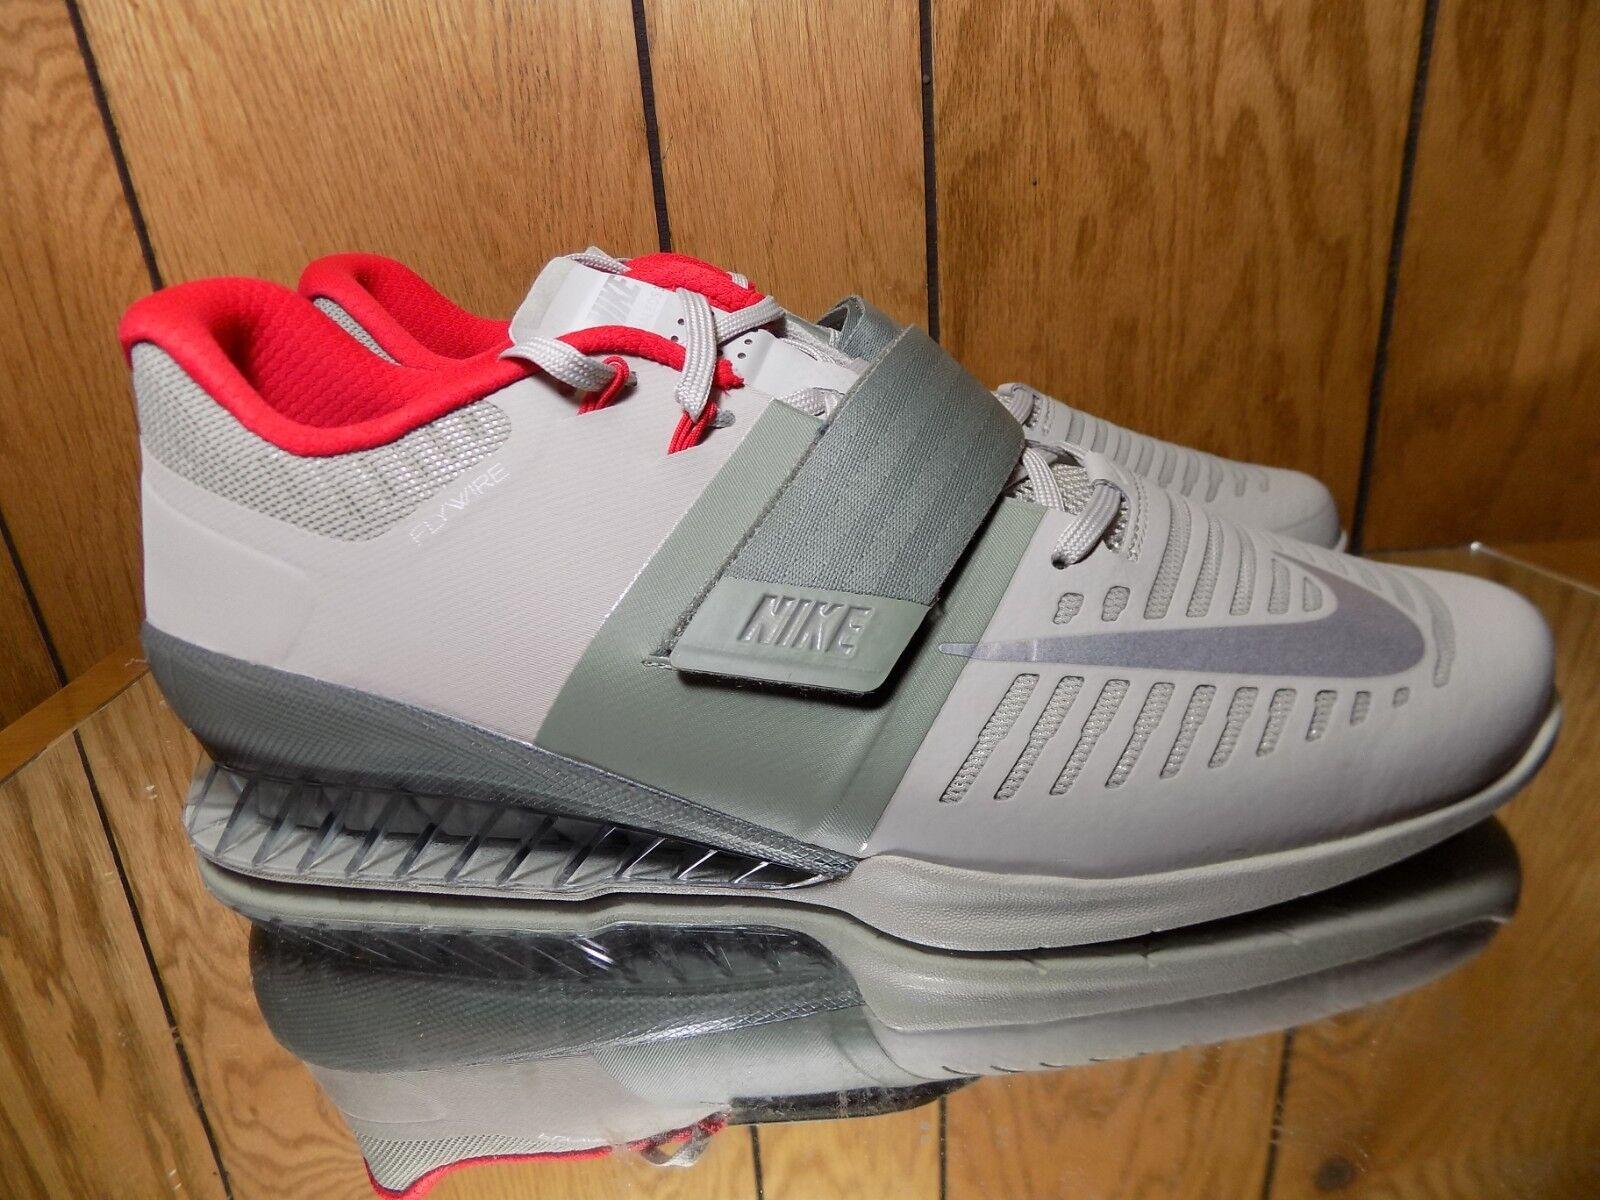 Nike Men's Cross Cross Cross Training Weightlifting Romaleos 3 shoes Sz. 12 NEW 852933-003 fab651